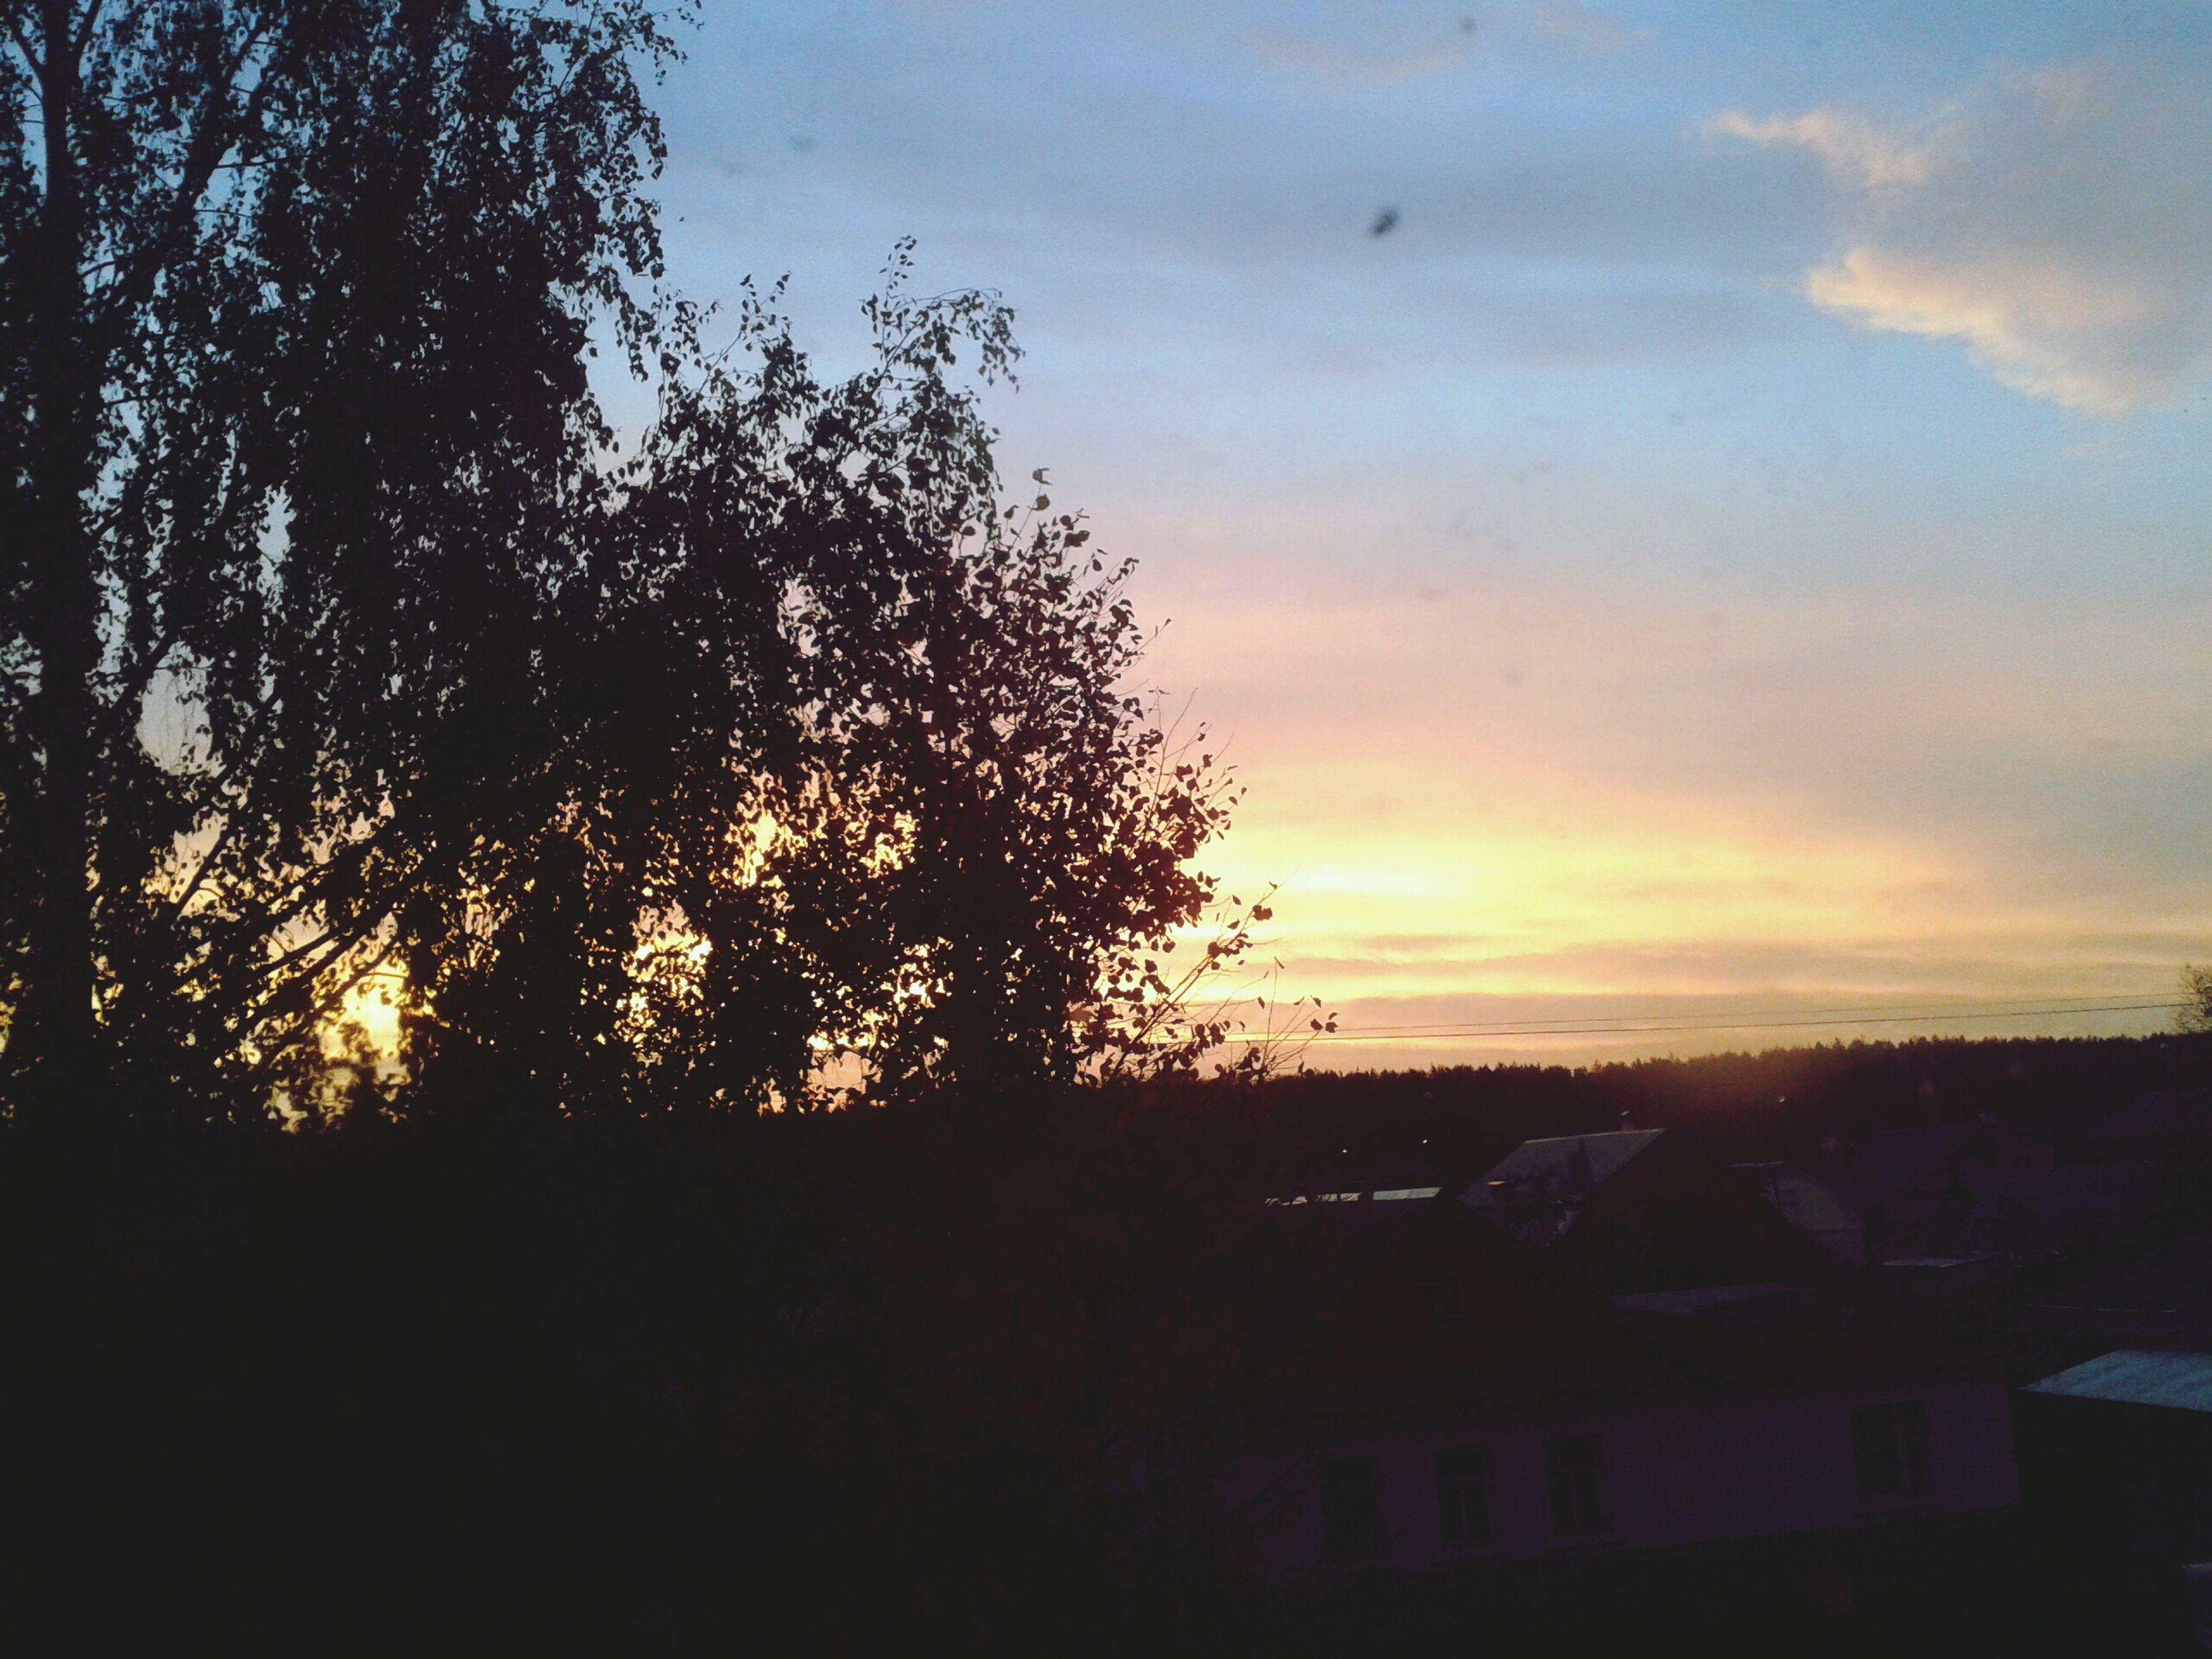 sunset, silhouette, sky, tree, scenics, beauty in nature, orange color, tranquil scene, tranquility, cloud - sky, nature, landscape, idyllic, cloud, outdoors, no people, dusk, built structure, building exterior, sunlight